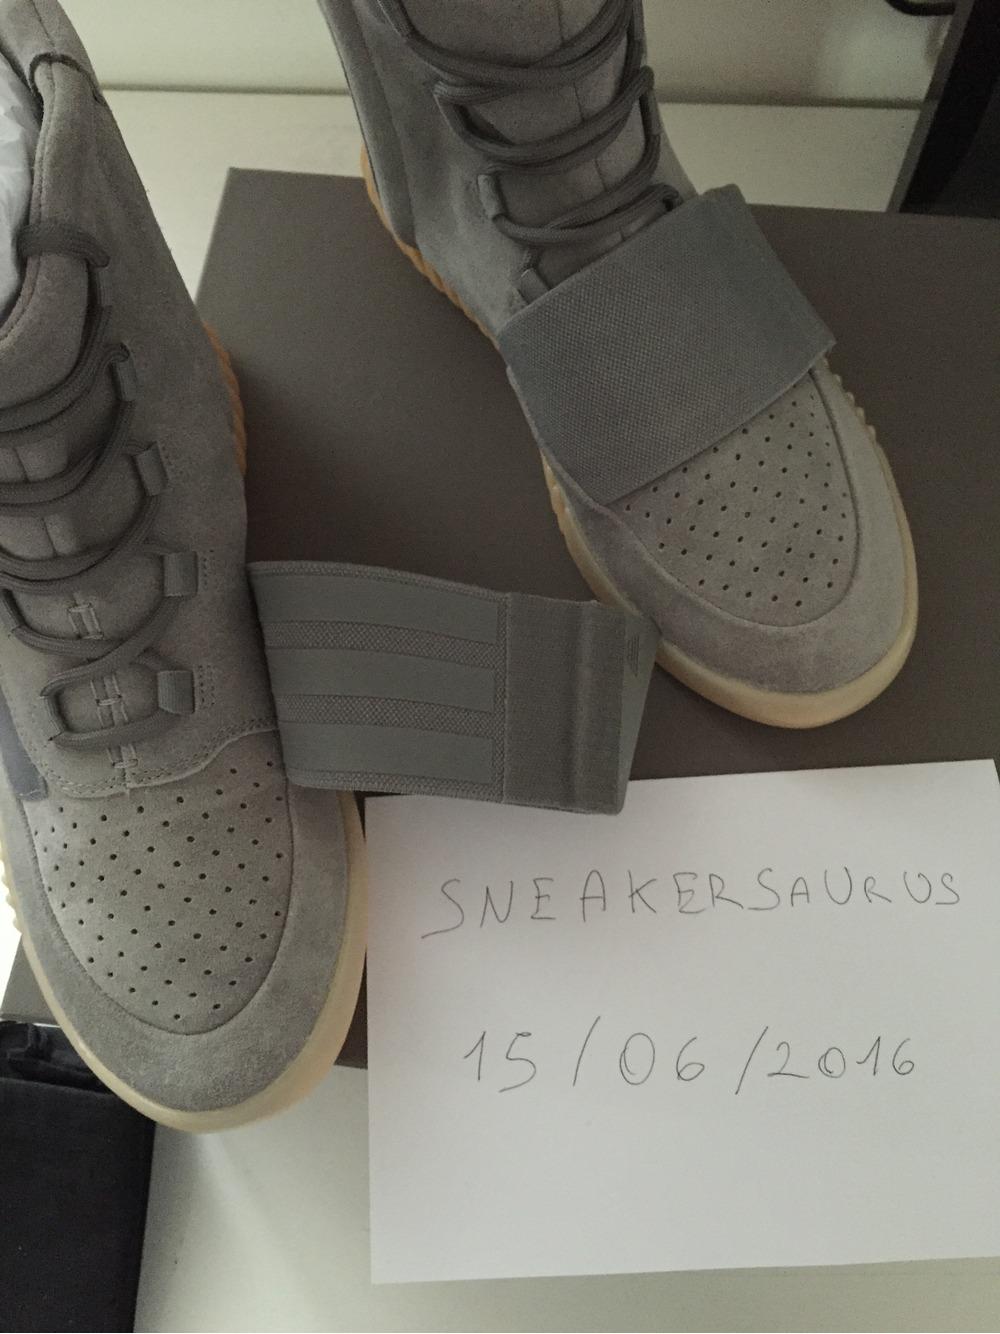 dc4fe8fe285b6 ... Adidas Yeezy Boost 750 light grey   gum size 10.5us 10 uk BB1840 -  photo ...